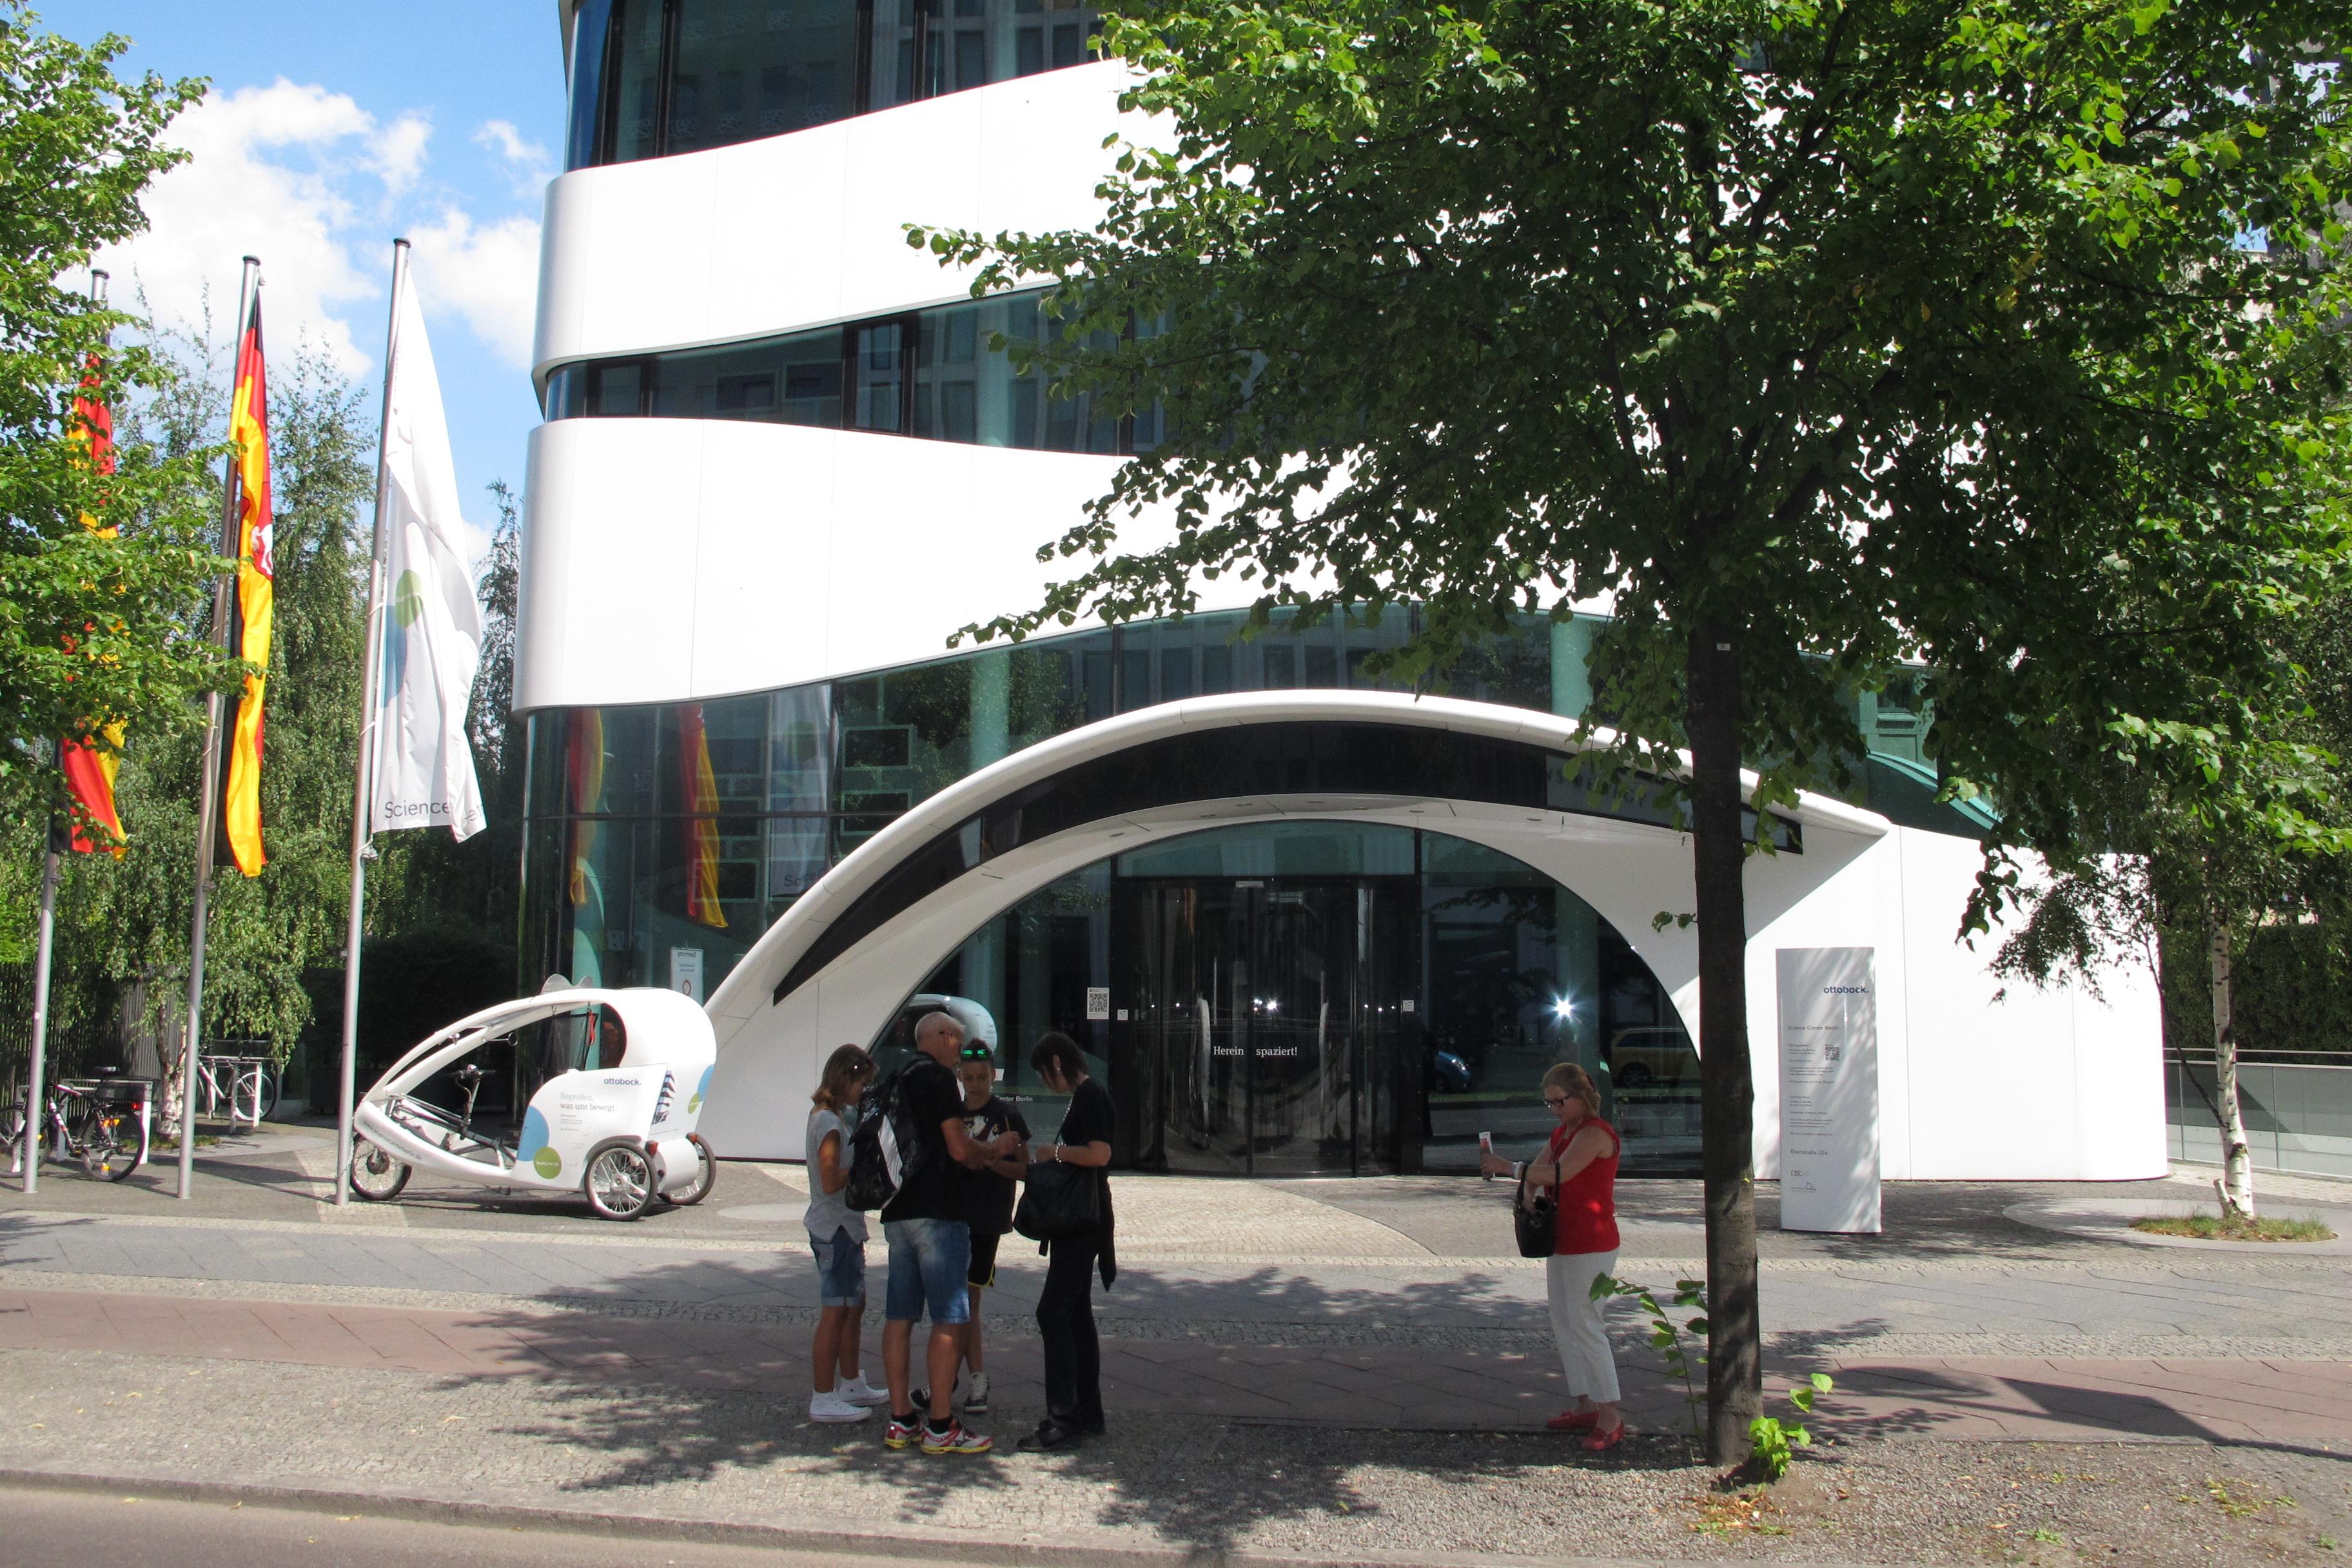 Science Center Medizintechnik